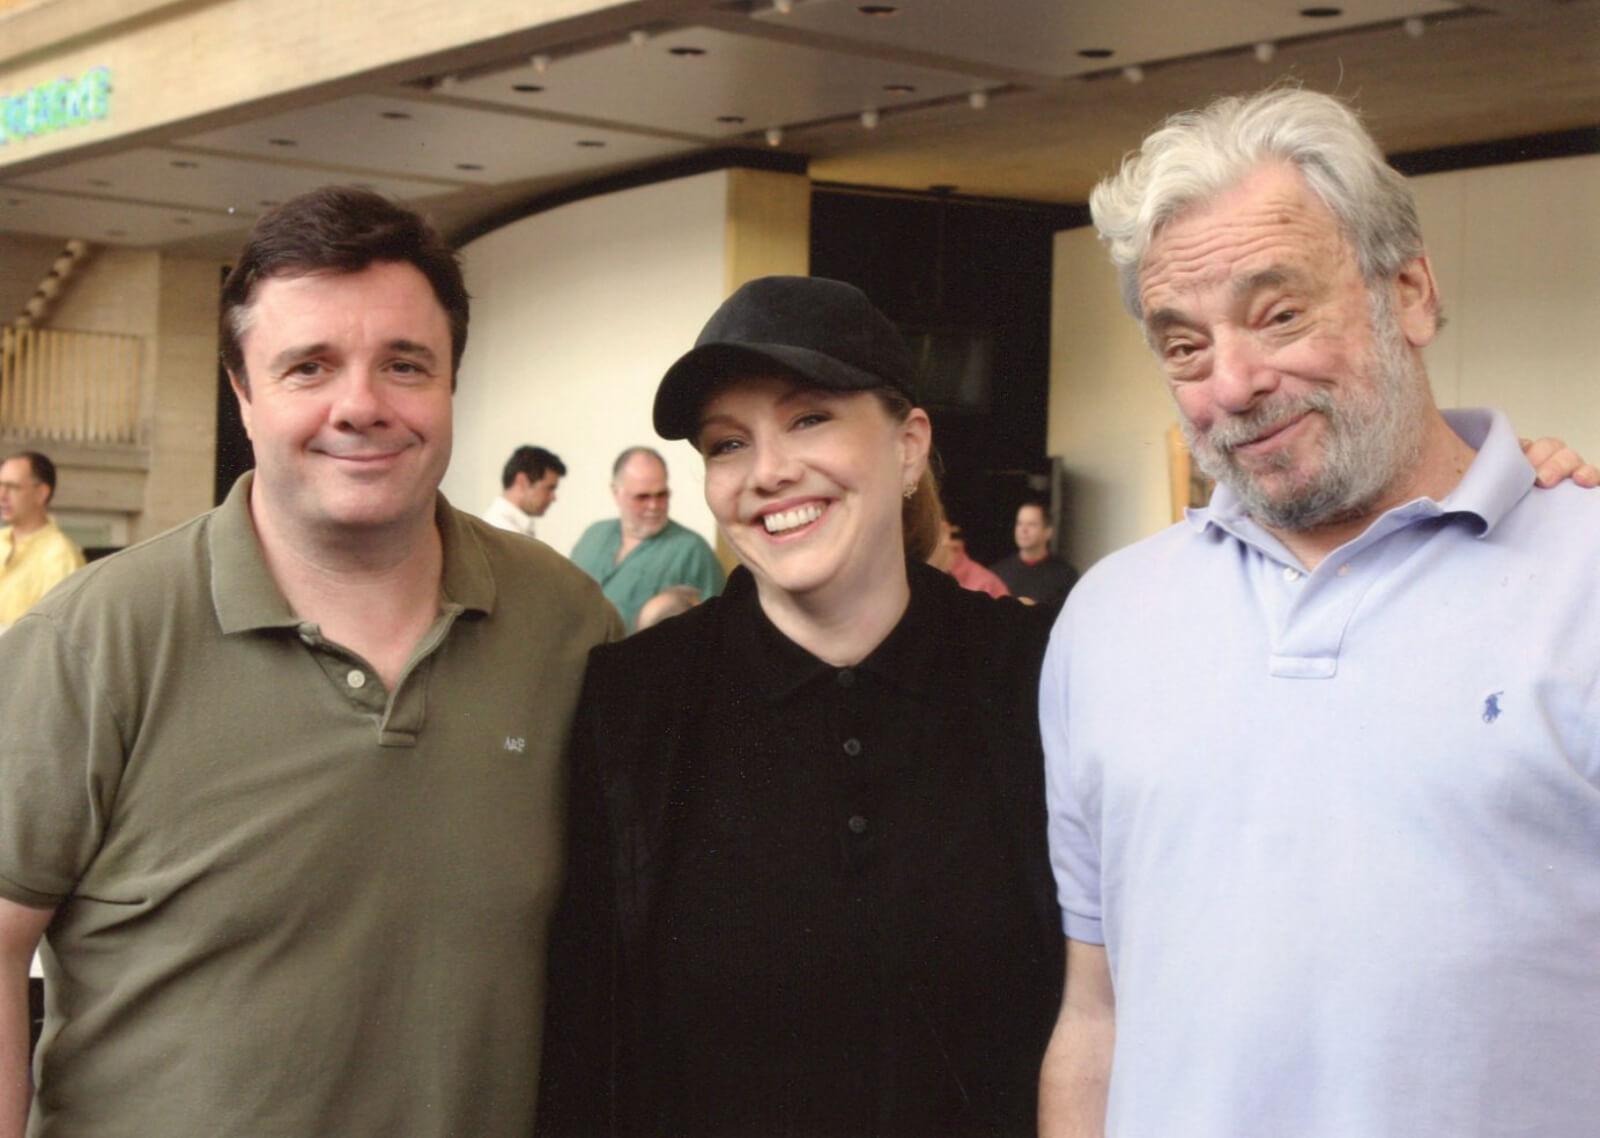 Nathan Lane, Susan Stroman and Stephen Sondheim.